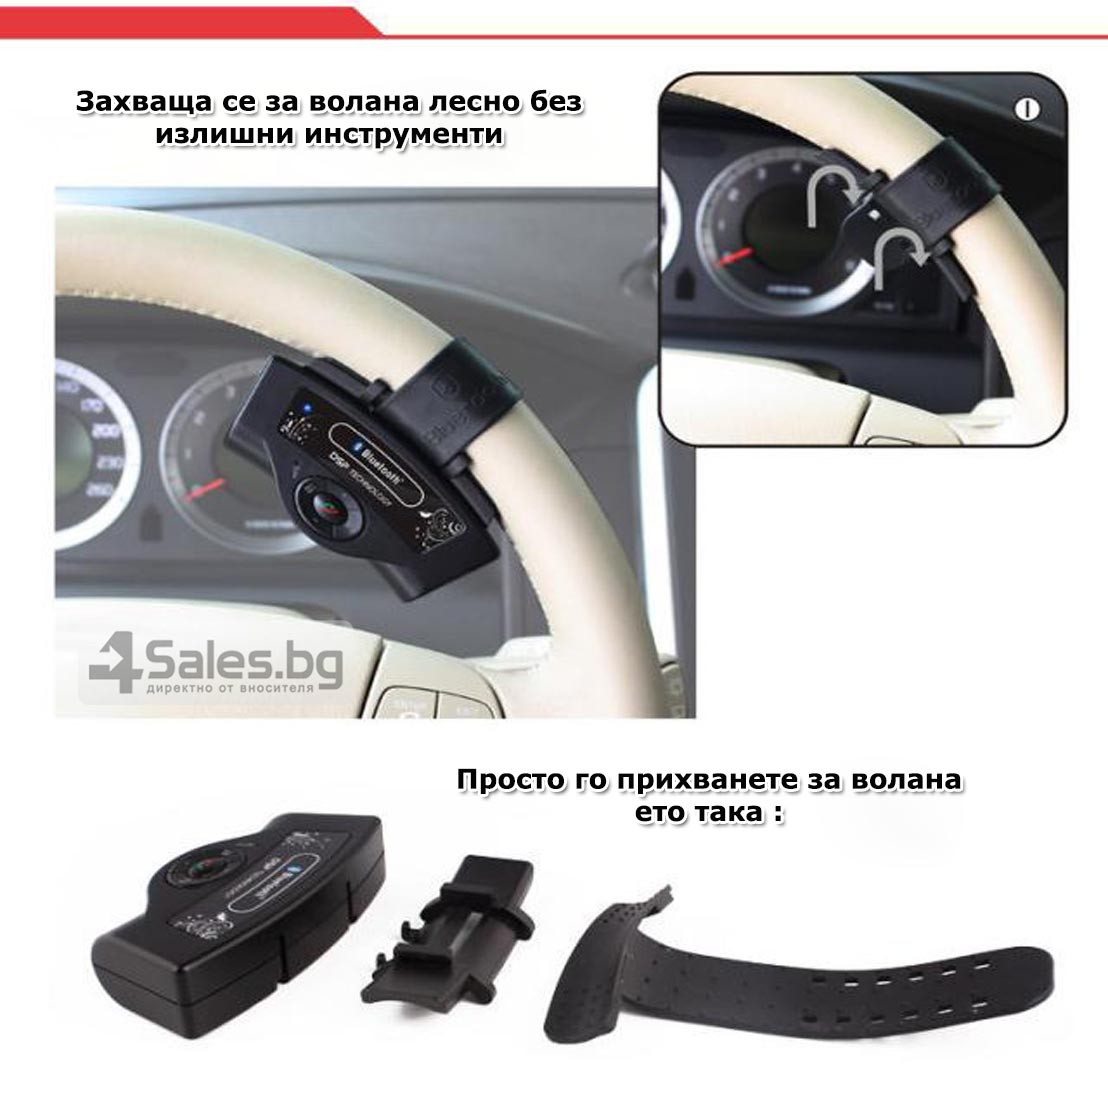 Bluetooth handsfree свободни ръце за волан на автомобил с високоговорител HF1 14